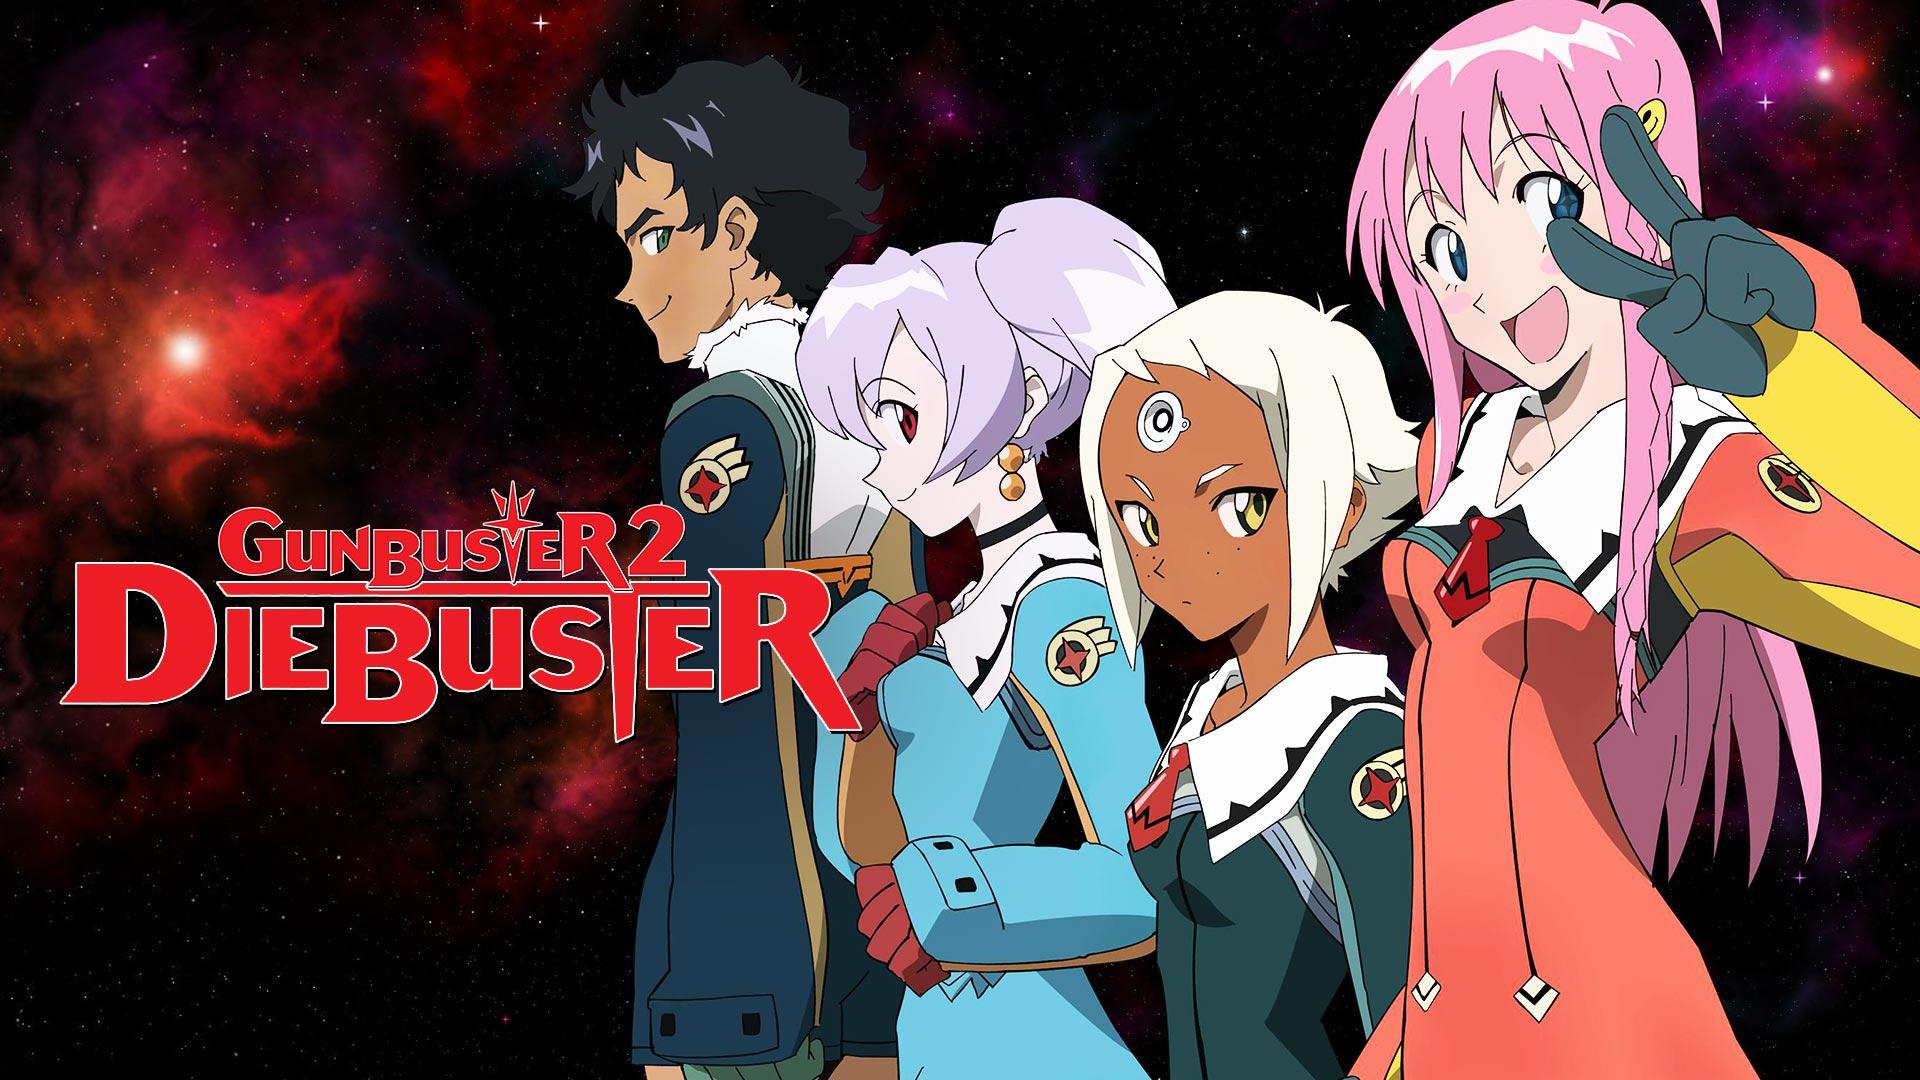 Diebuster (Gunbuster 2)